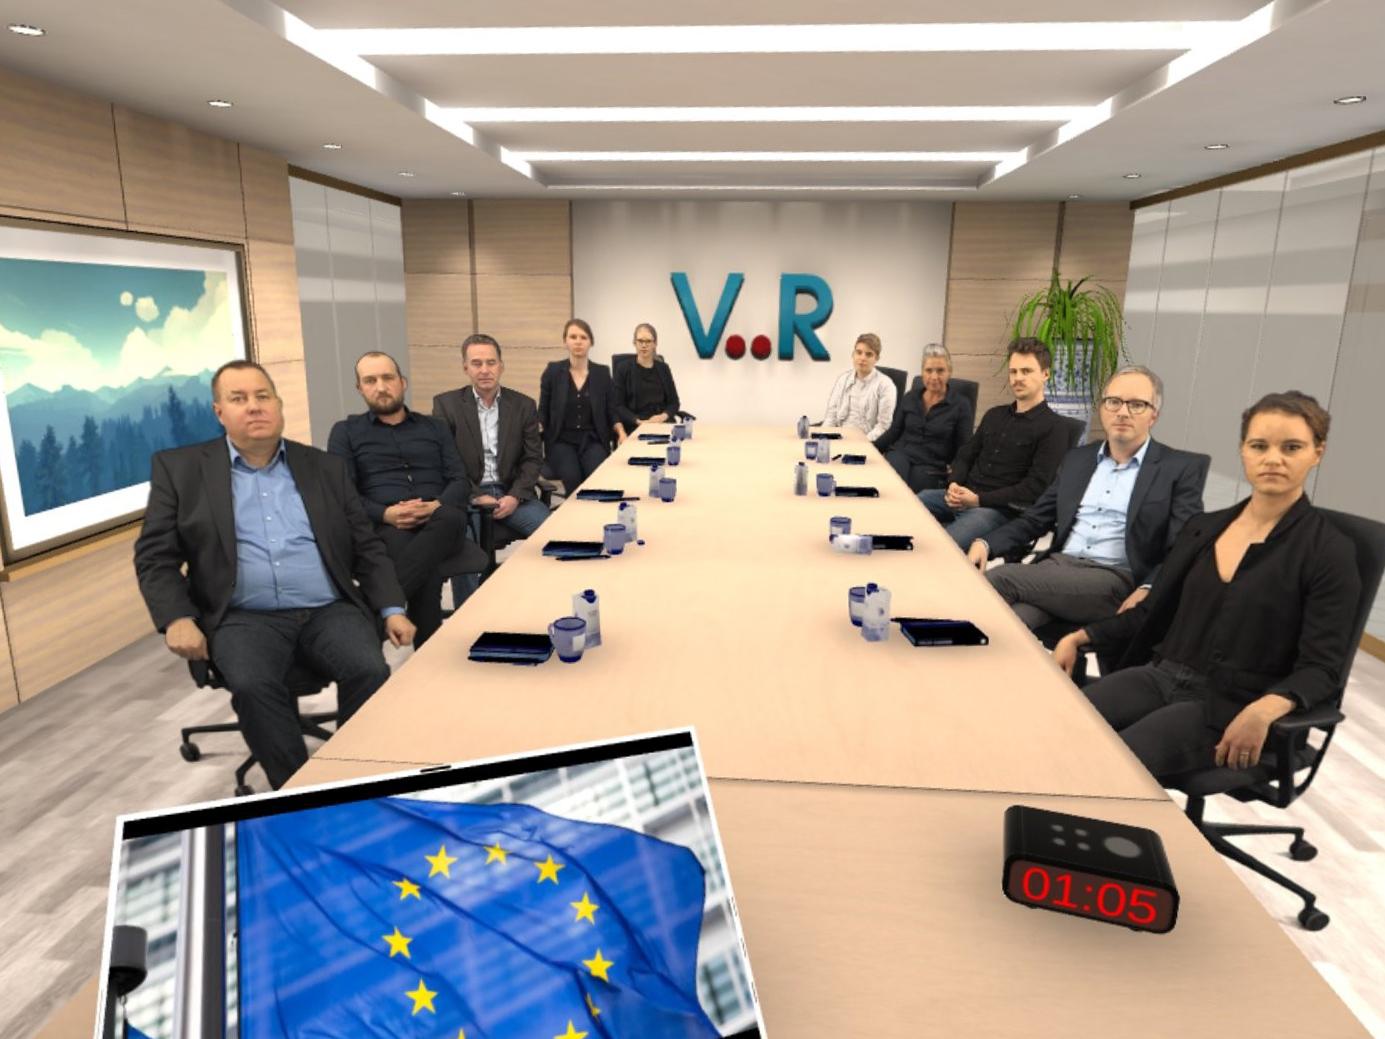 Ein Blick in den Virtual-Reality-Meeting-Raum.